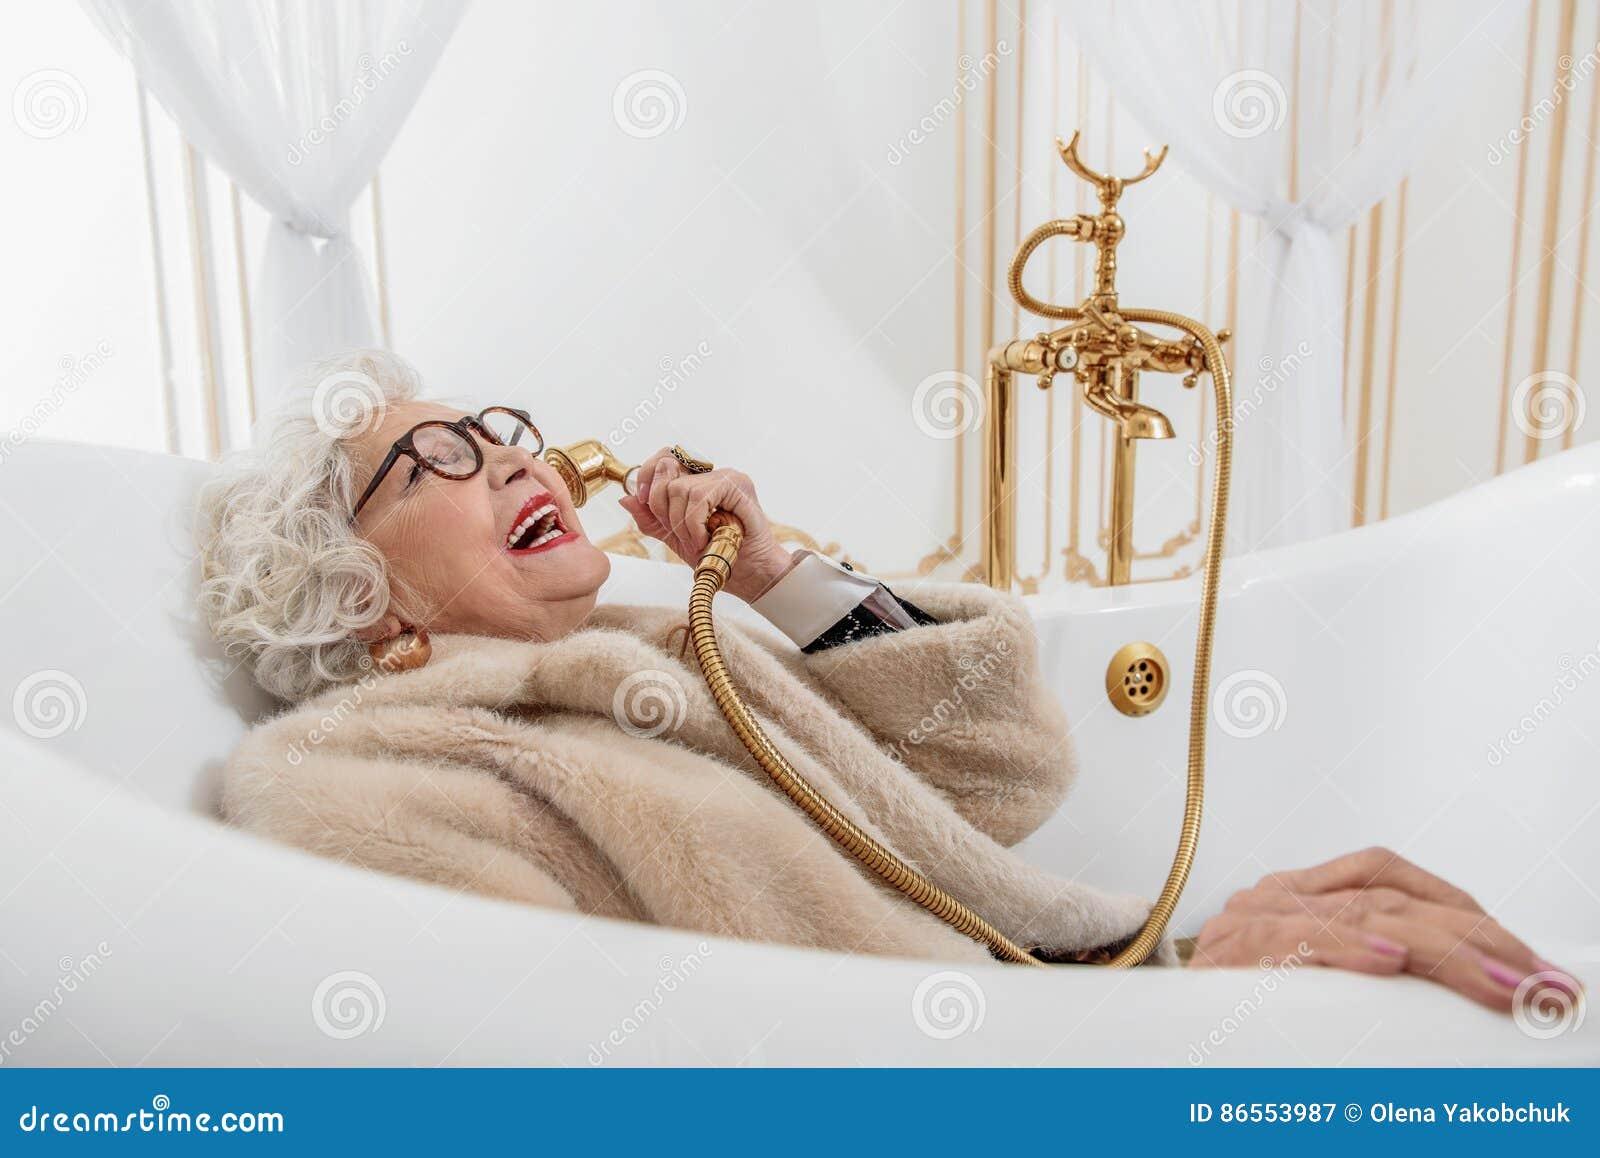 Mature lady bathtube